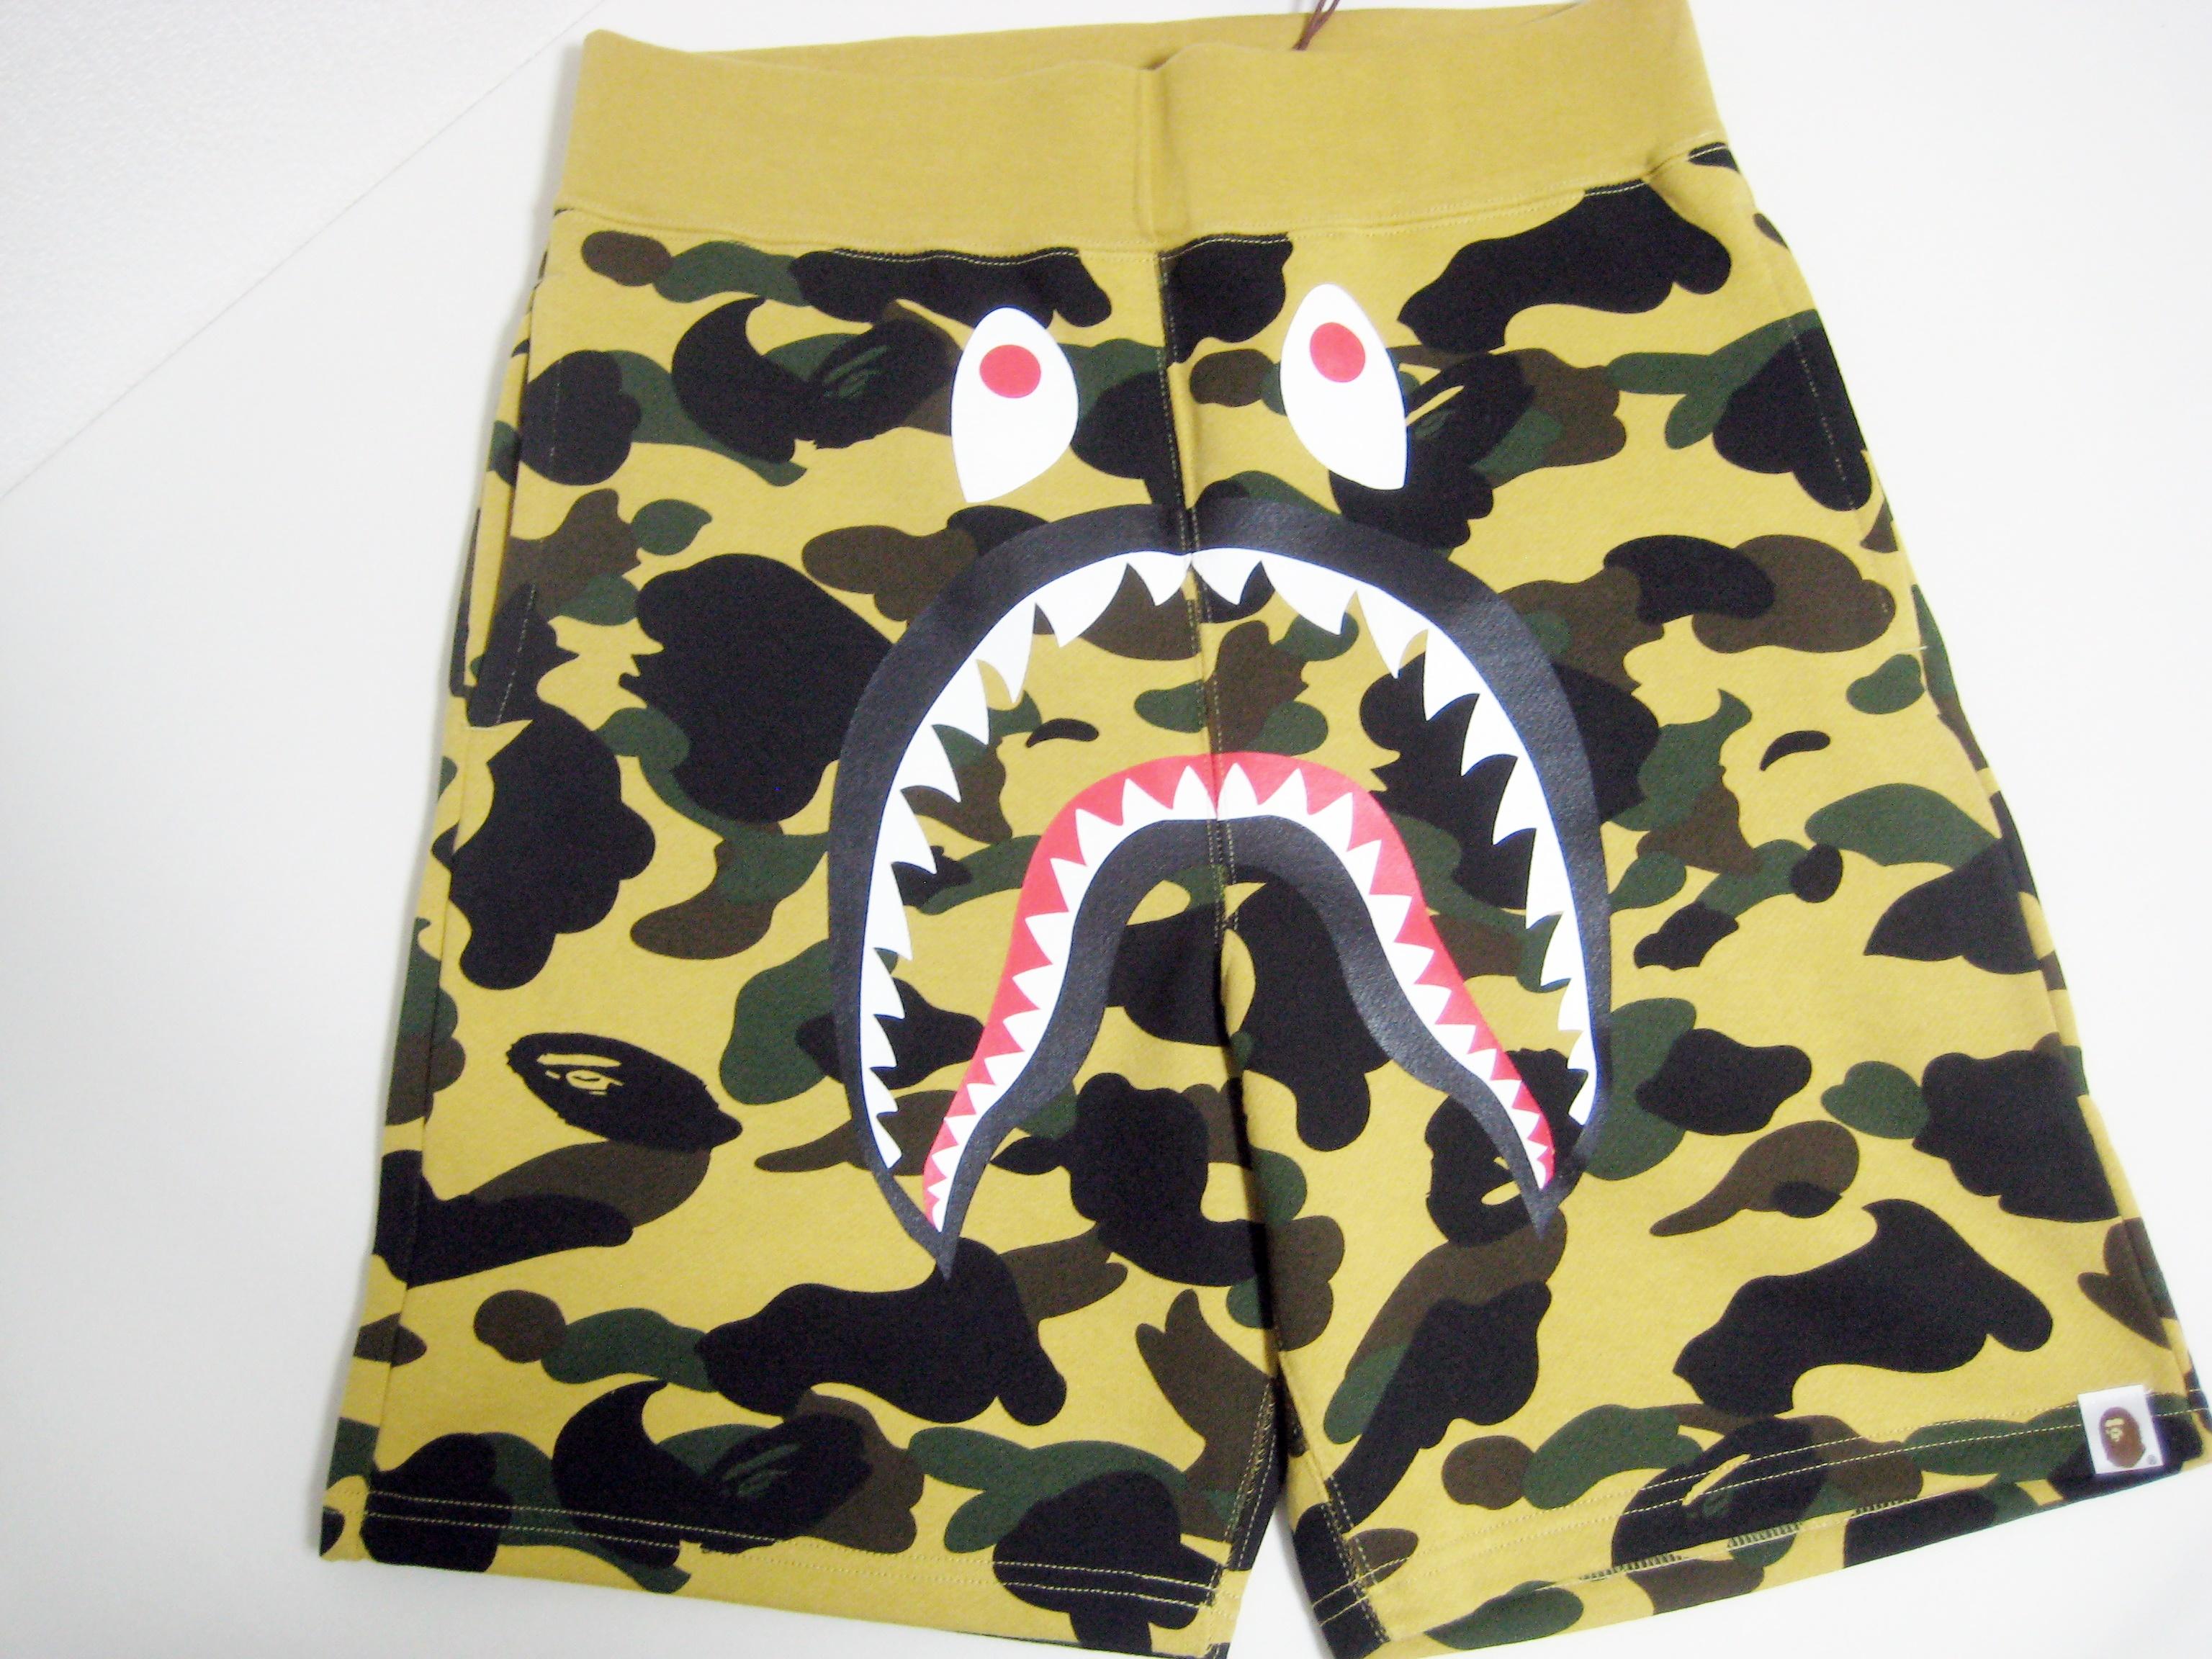 8c0b11691f15 Bape A BATHING APE BAPE 1ST CAMO SHARK SWEAT SHORTS yellow M brand ...